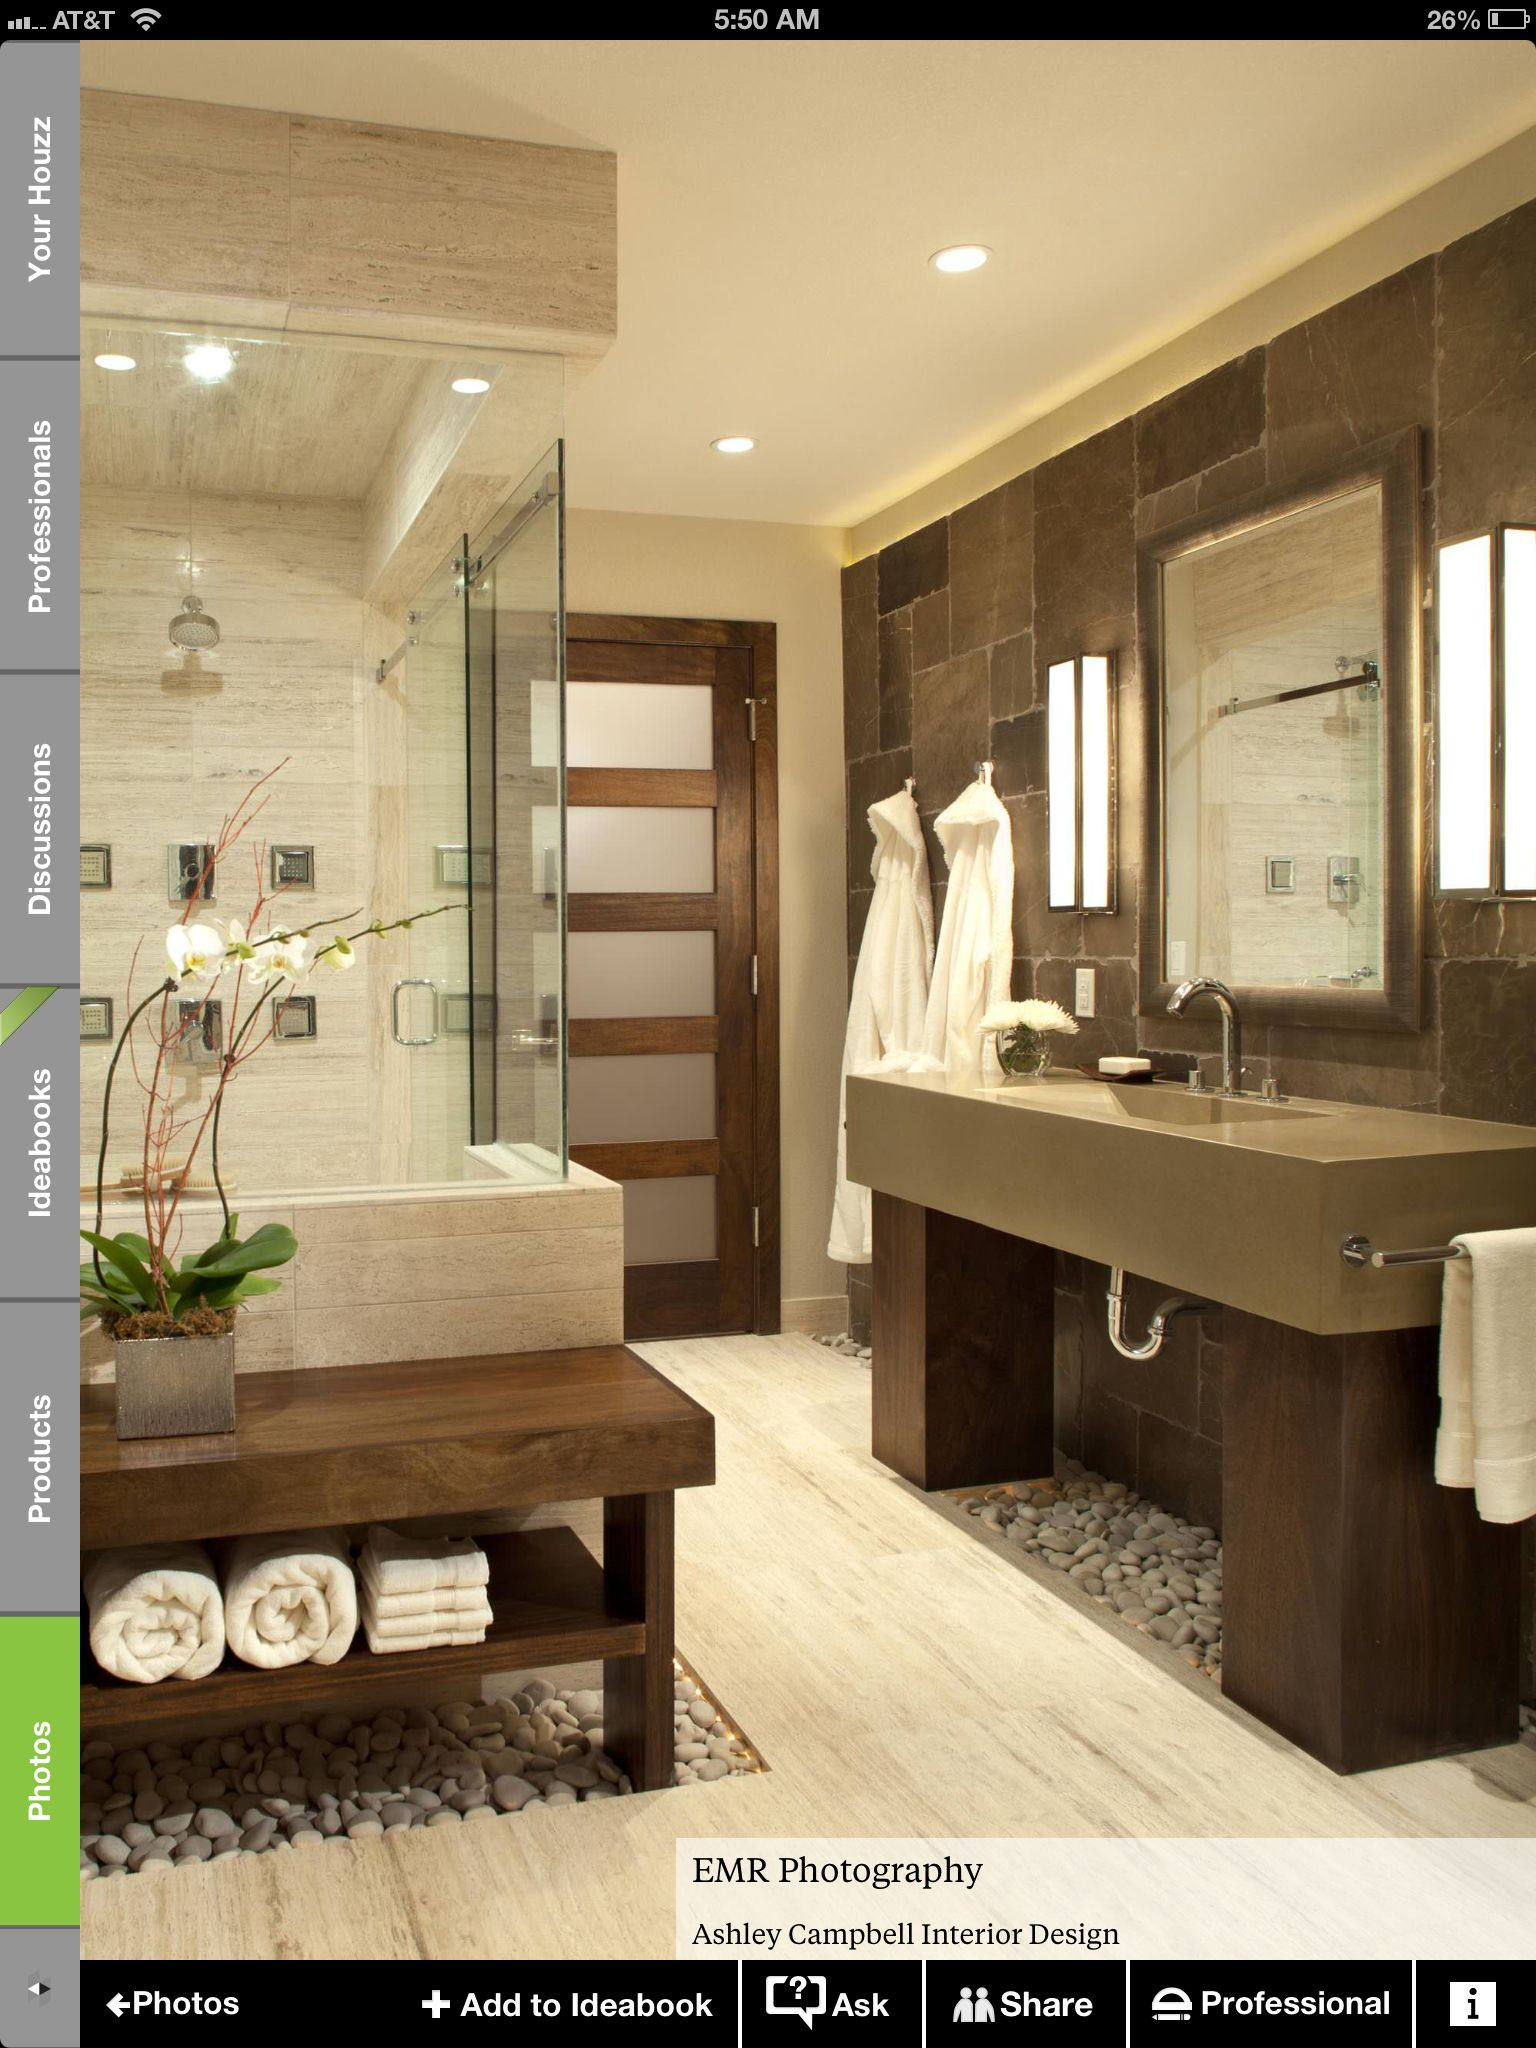 Gut Basement Bathroom , Kind Of Zen Beton Badezimmer, Waschraum, Badezimmer  Design, Waschbecken,